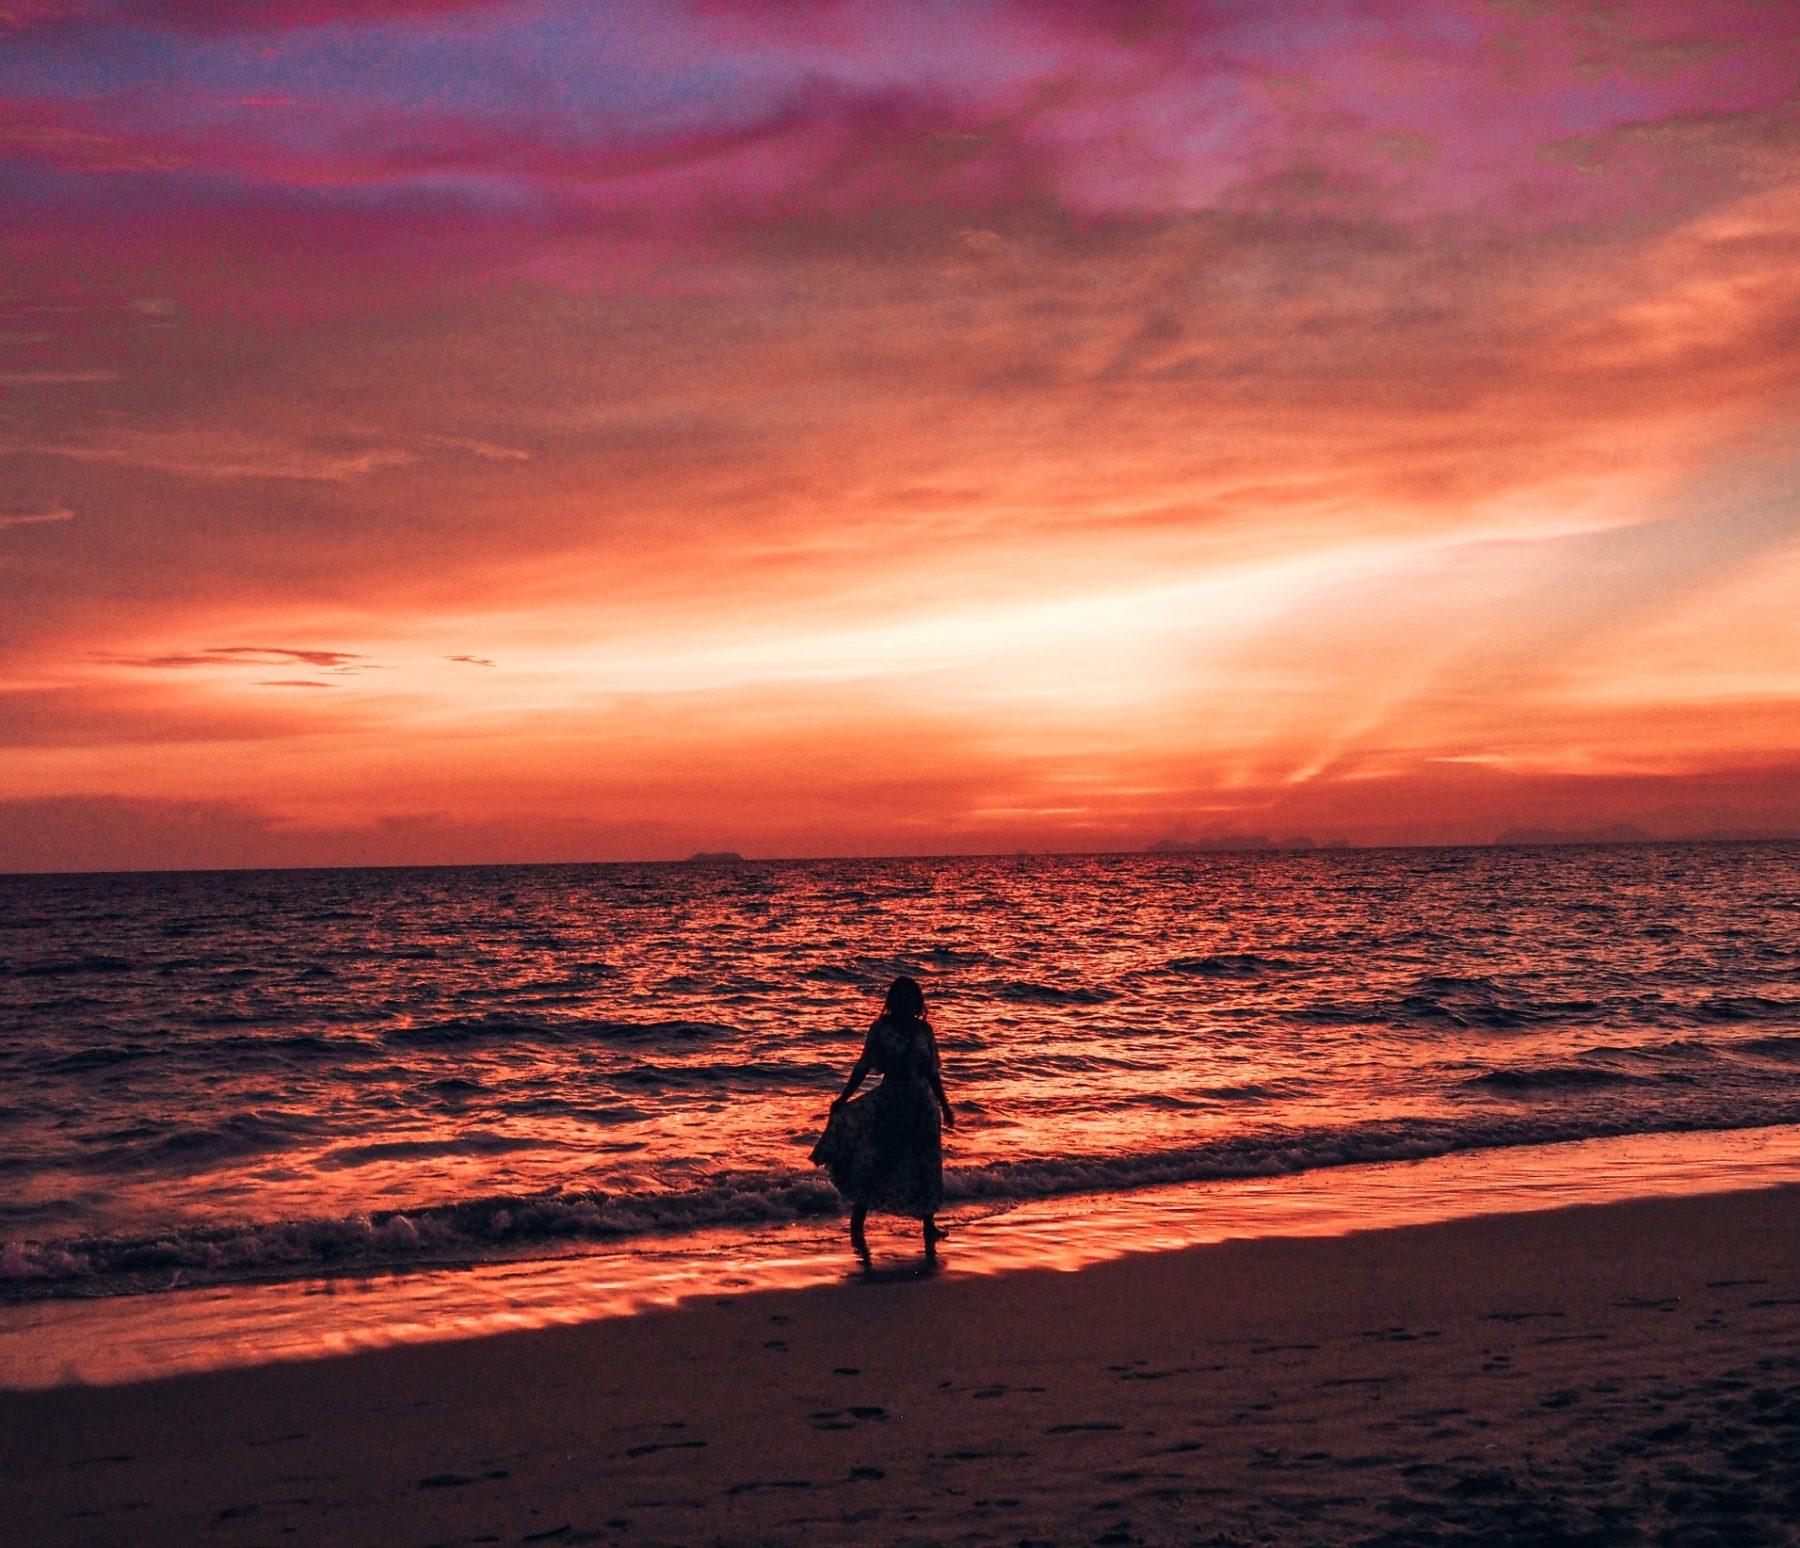 Absolutely Lucy sunset ibiza holidays, Thailand Koh Lanta beach shots 2019